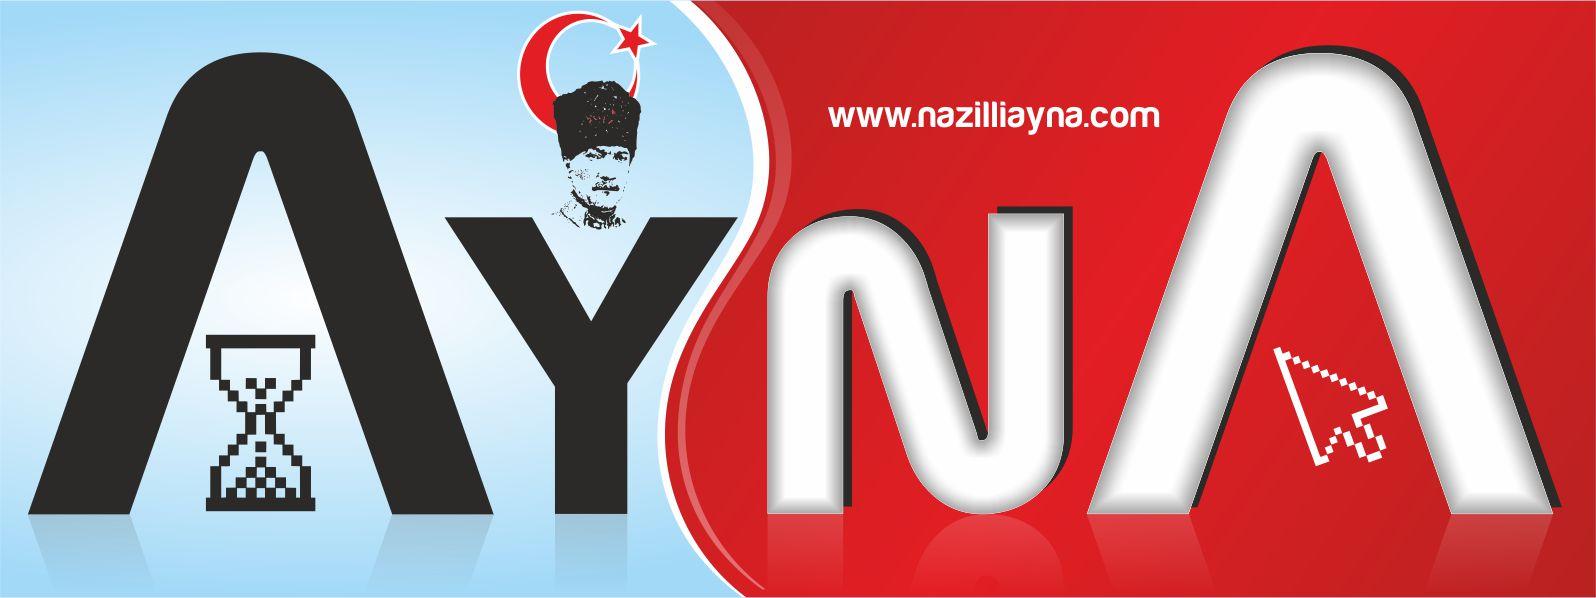 Nazilli Ayna Gazetesi